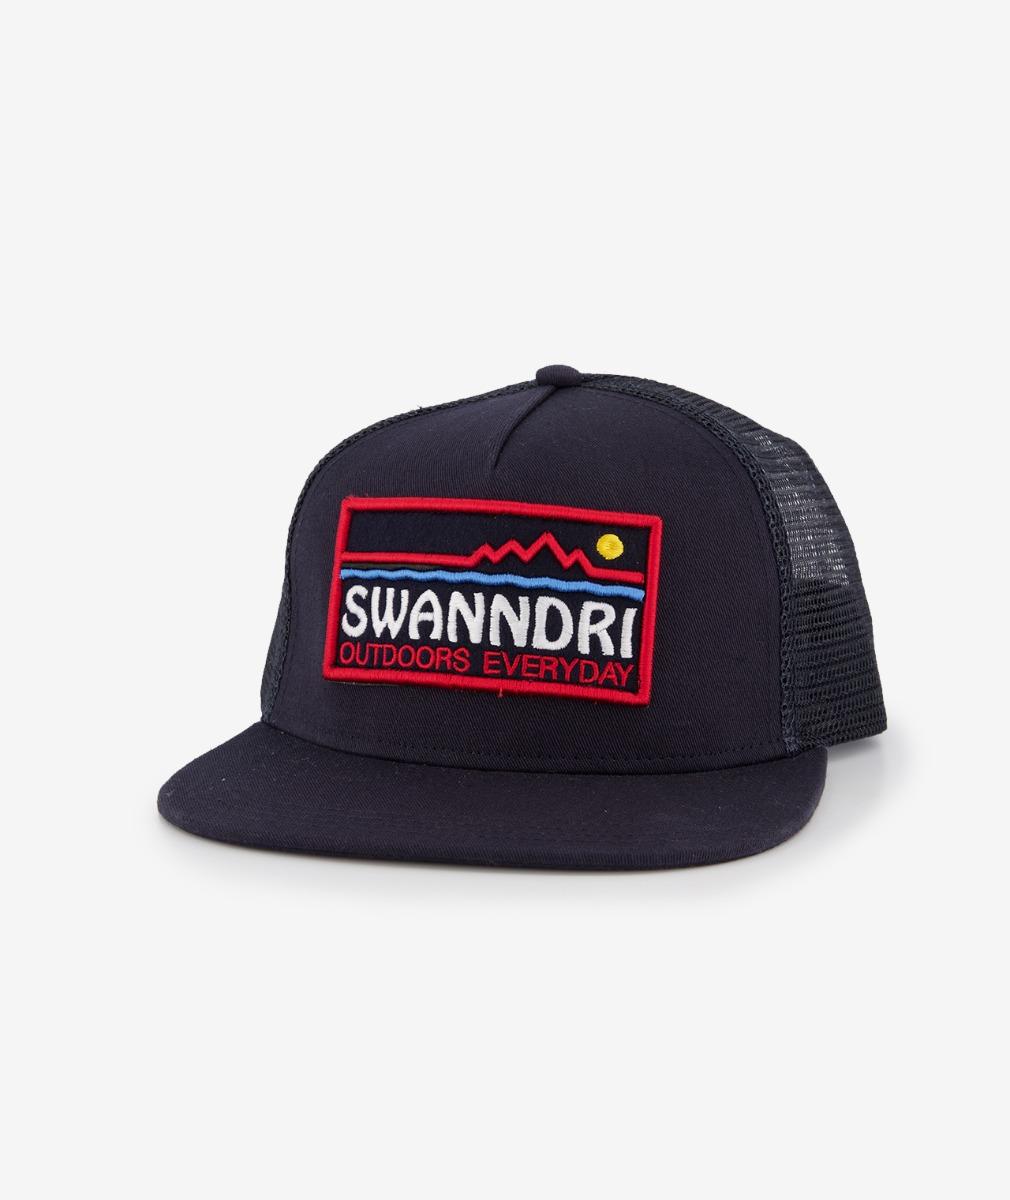 Swanndri Browns Bay Cap